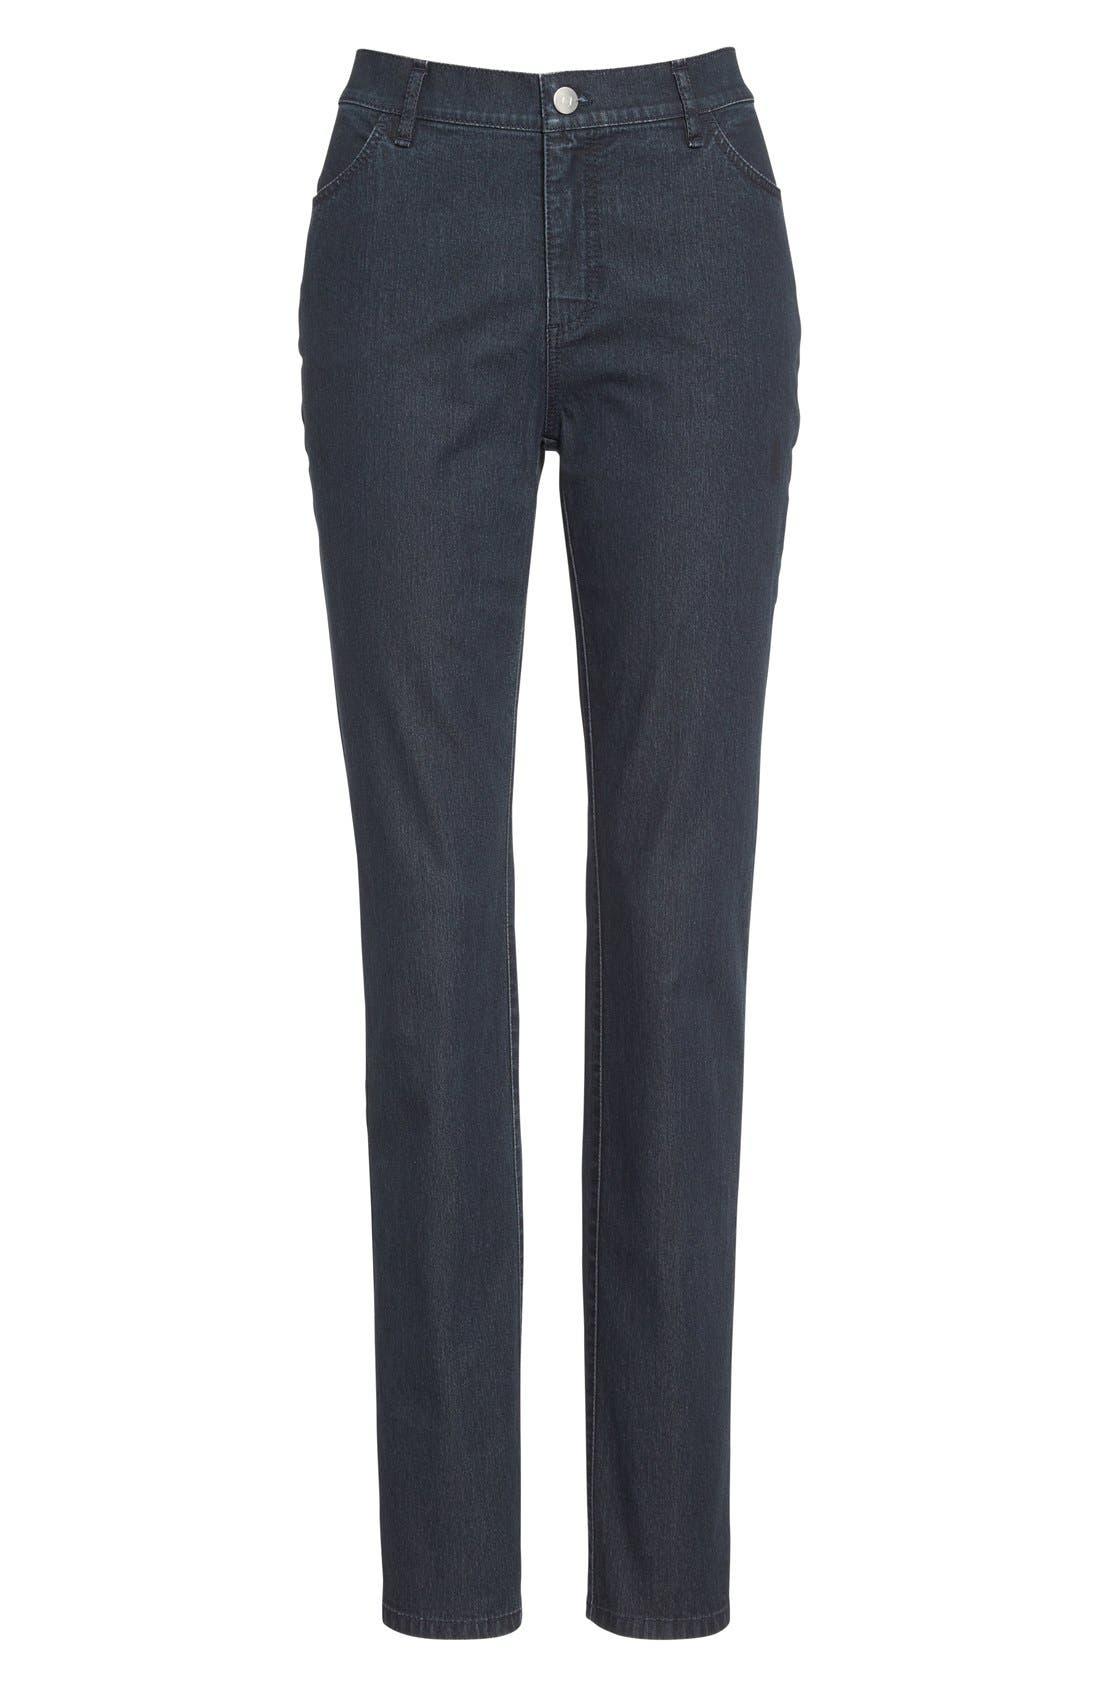 'Primo Denim' Curvy Fit Slim Leg Jeans,                             Alternate thumbnail 33, color,